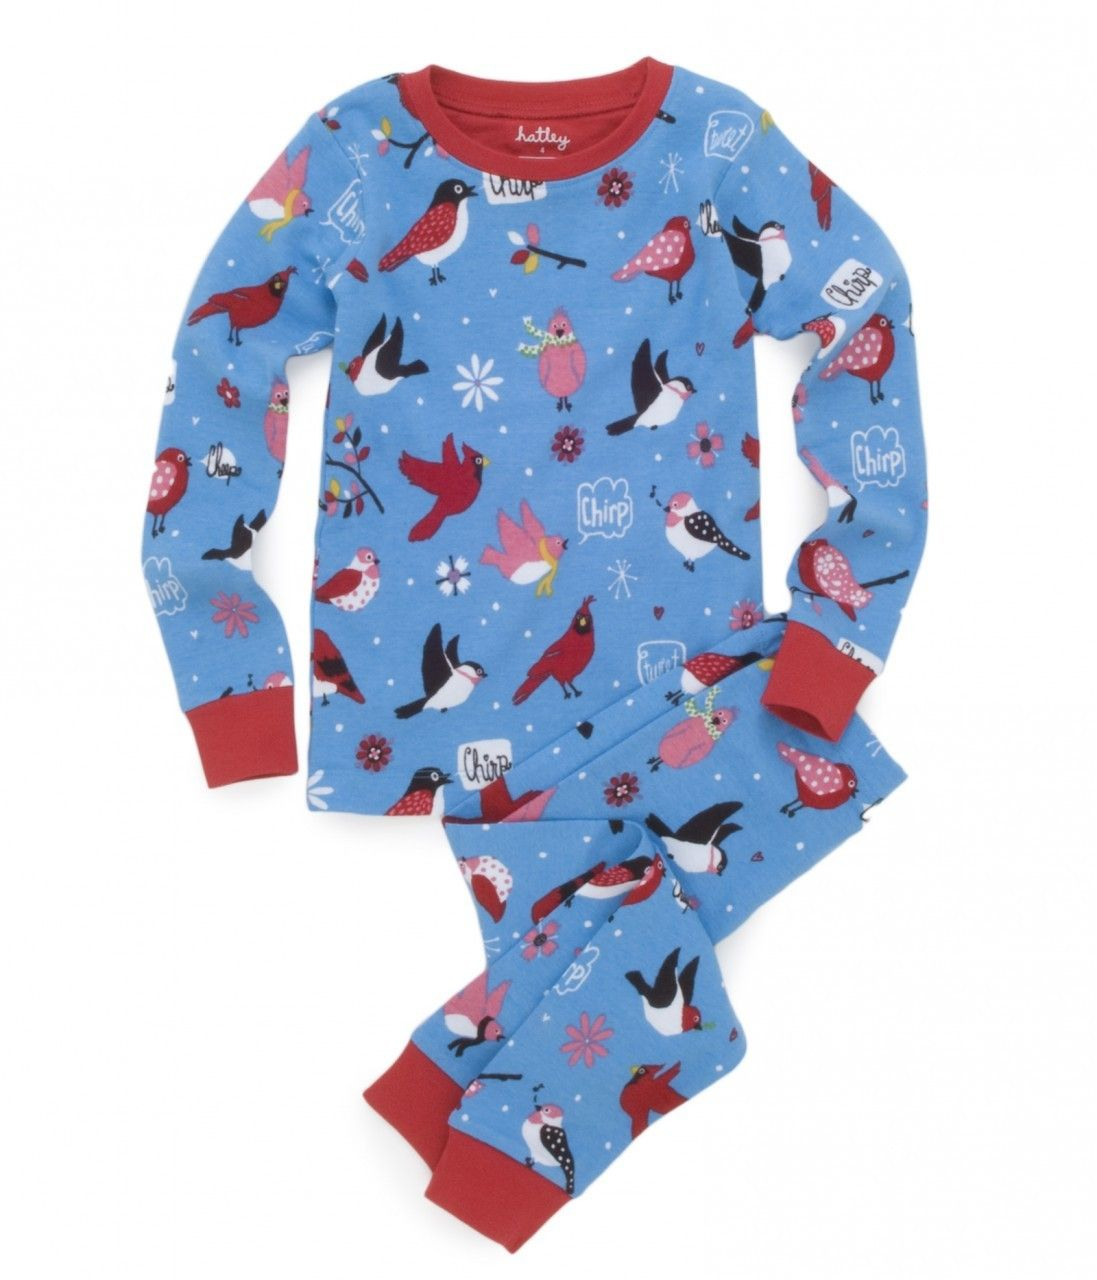 1f4786339ac9 PLANET PYJAMA - The Australian home of quality cotton kids pyjamas and  girls nighties . -